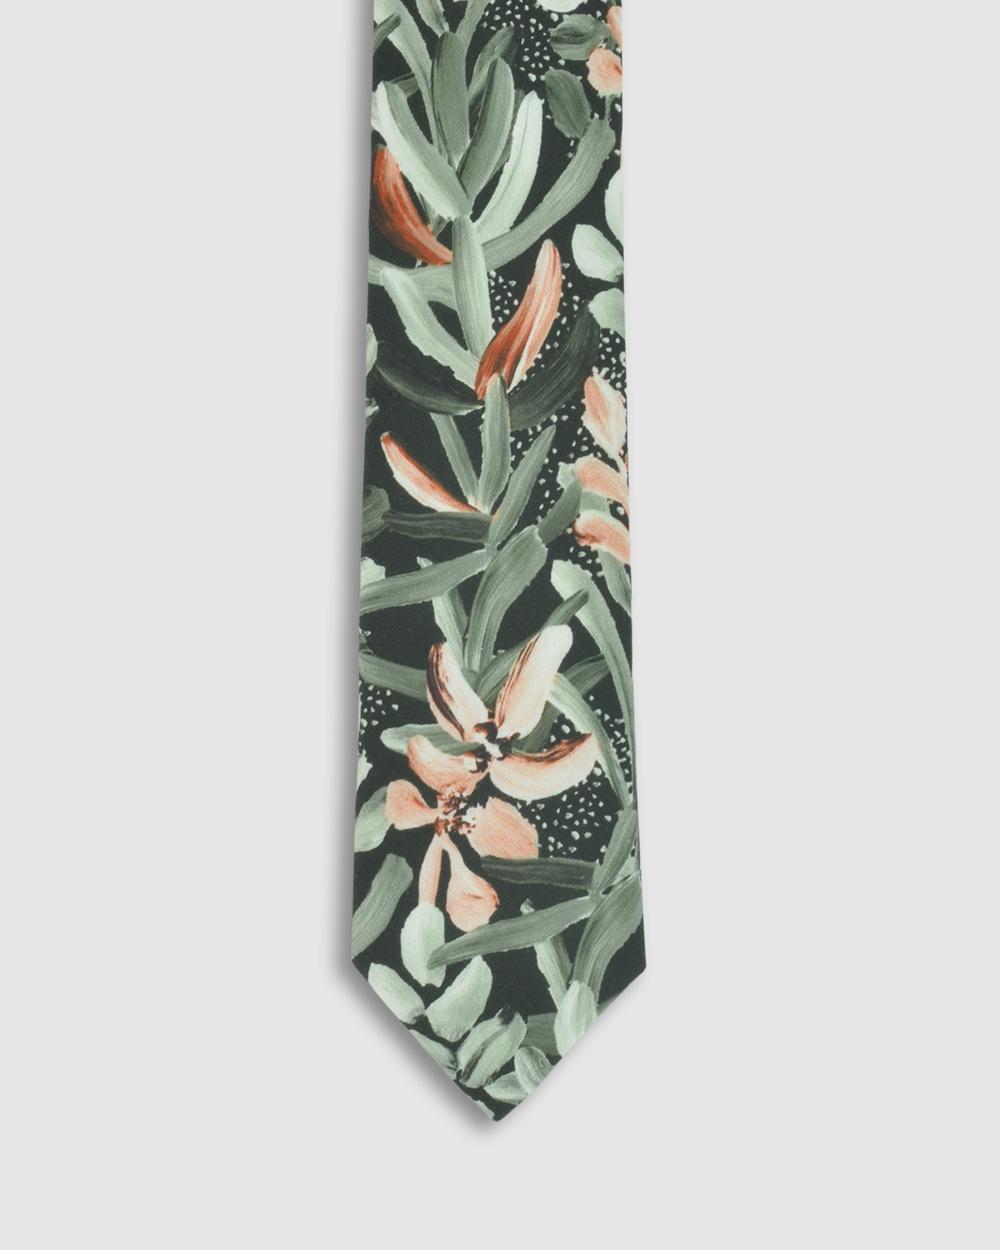 Peggy and Finn Protea Tie Ties Green Australia